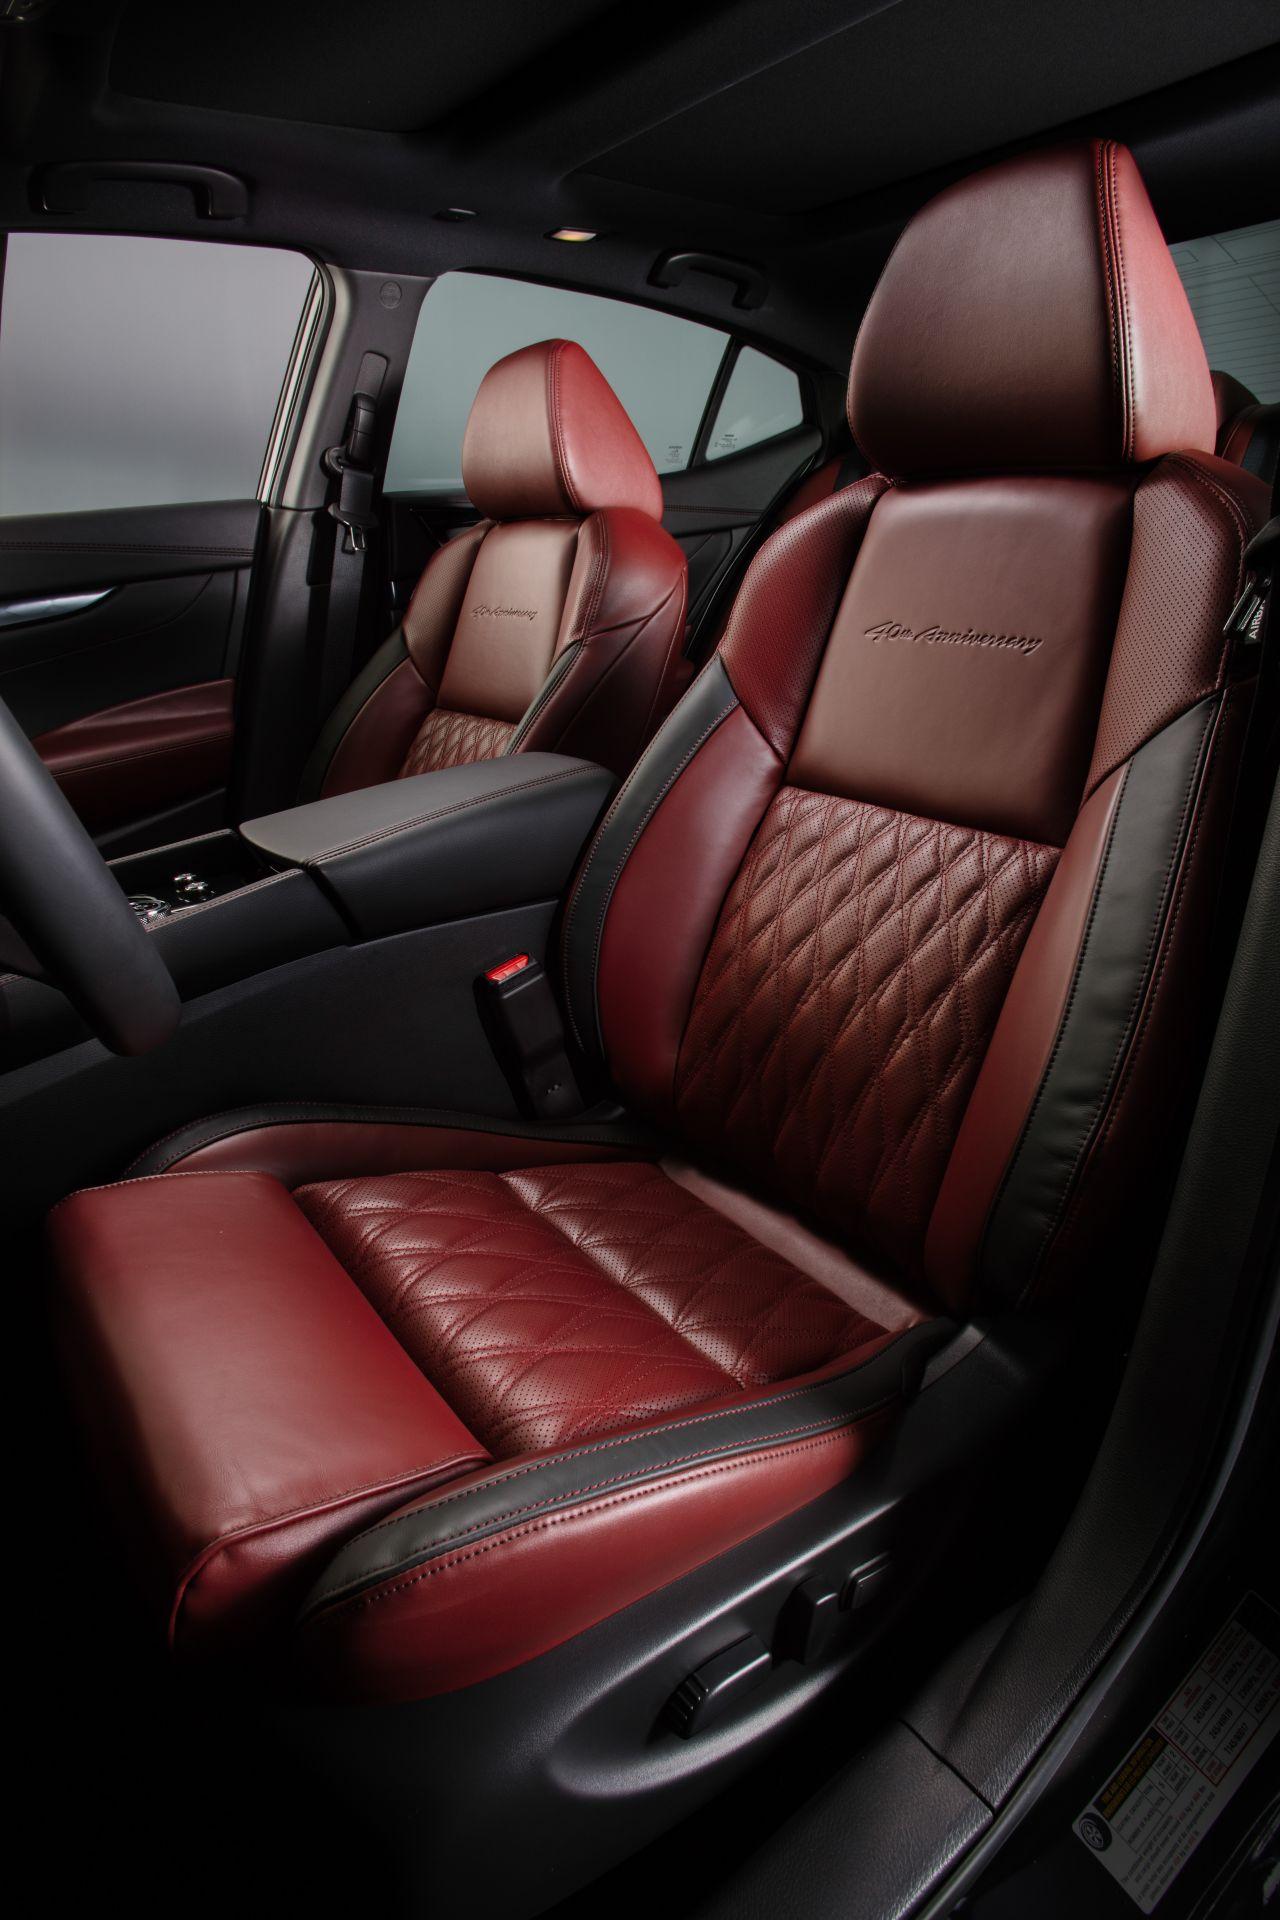 Nissan-Maxima-40th-Anniversary-Edition-15